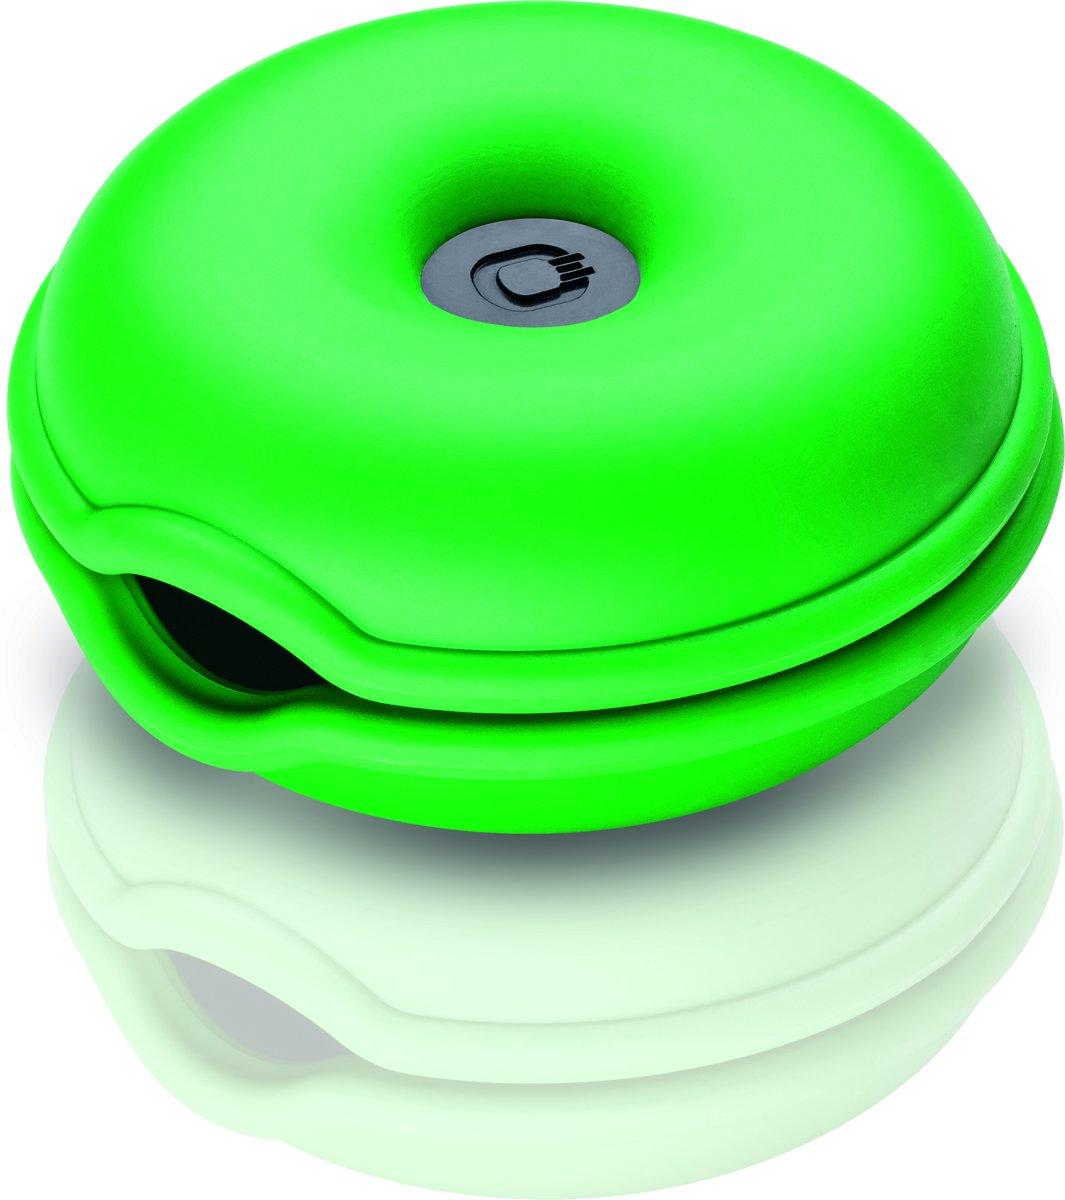 OEHLBACH Easy Case Siliconencase voor in-ear-hoofdtelefoonkabel diameter 4,5 cm groen kopen